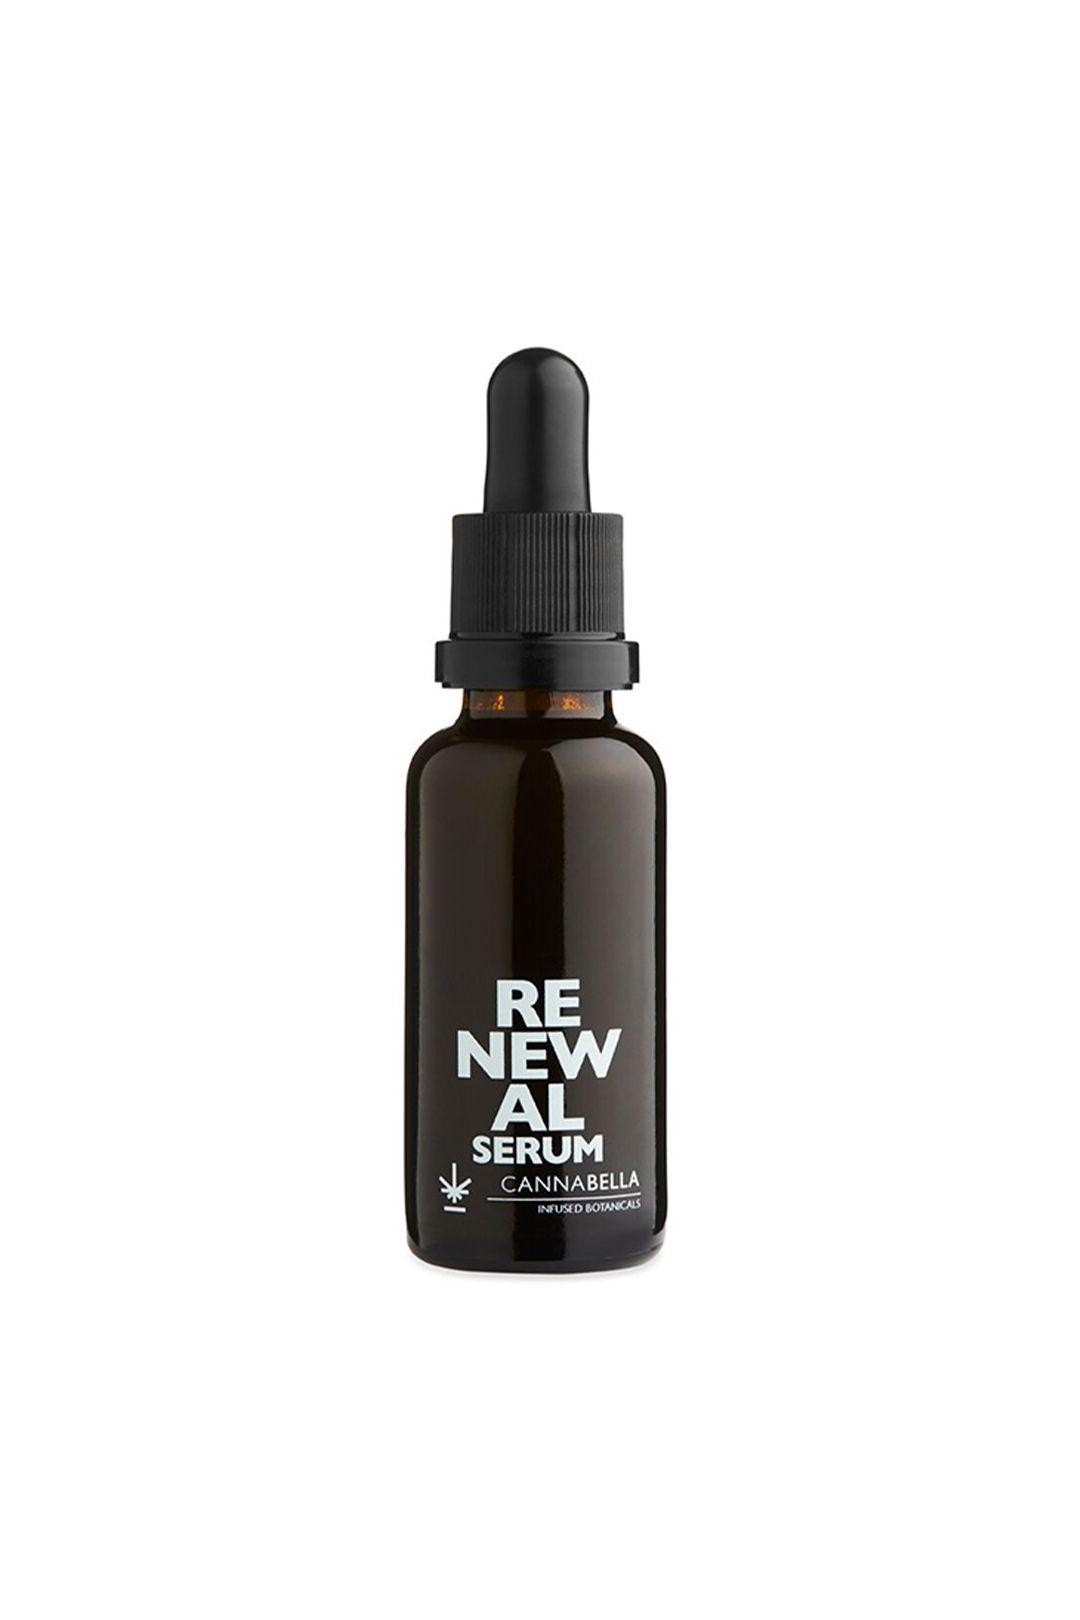 cannabella-renewal-serum